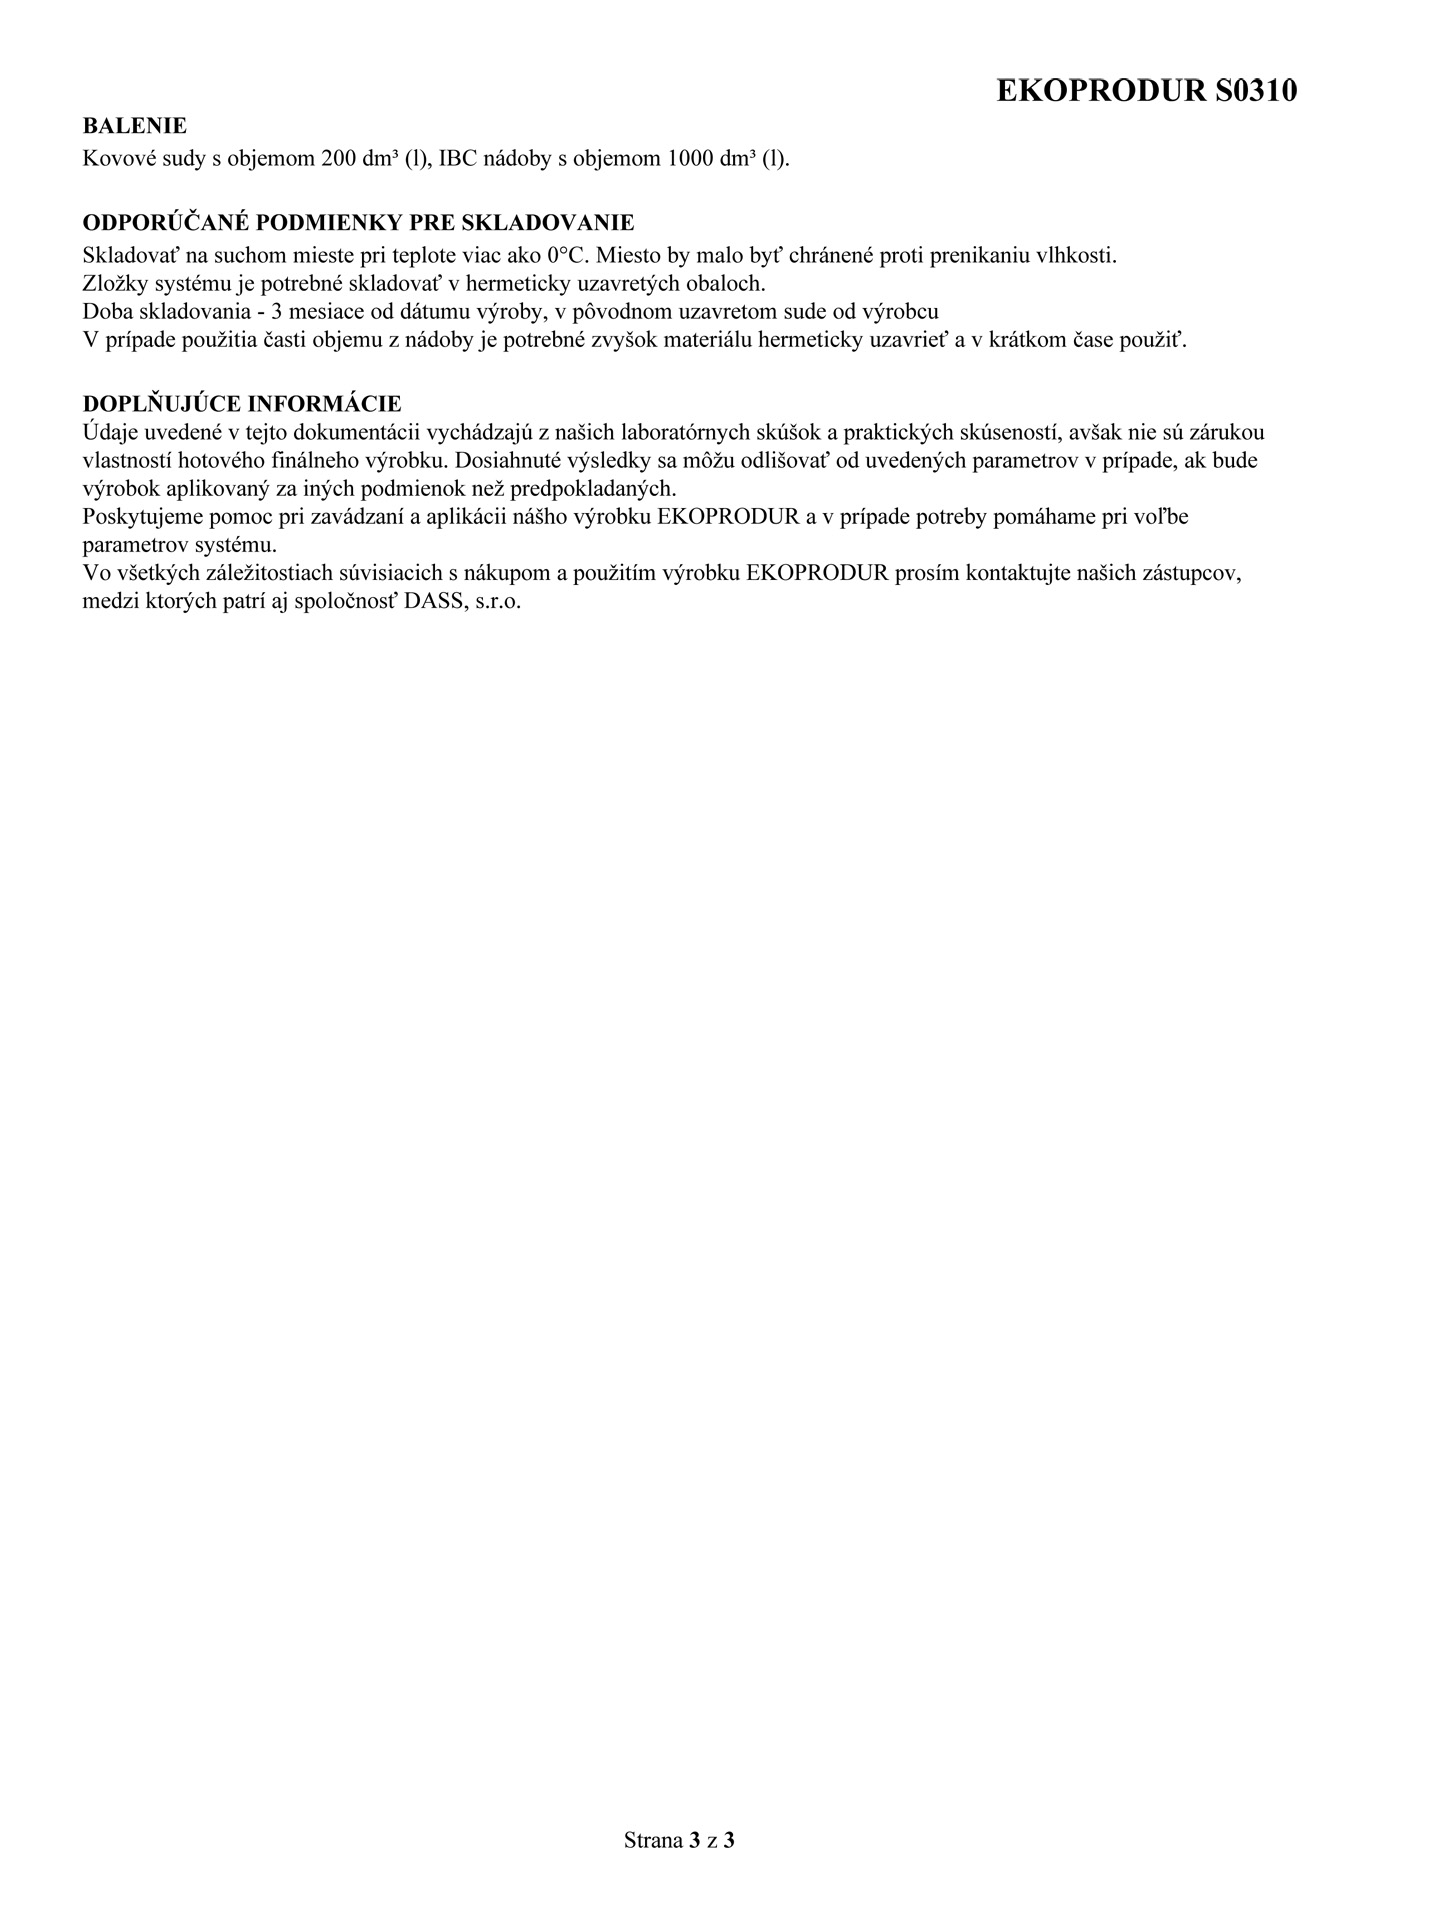 2f03abb1f 3/3 Certifikát mäkká pena EKOPRODUR S0310